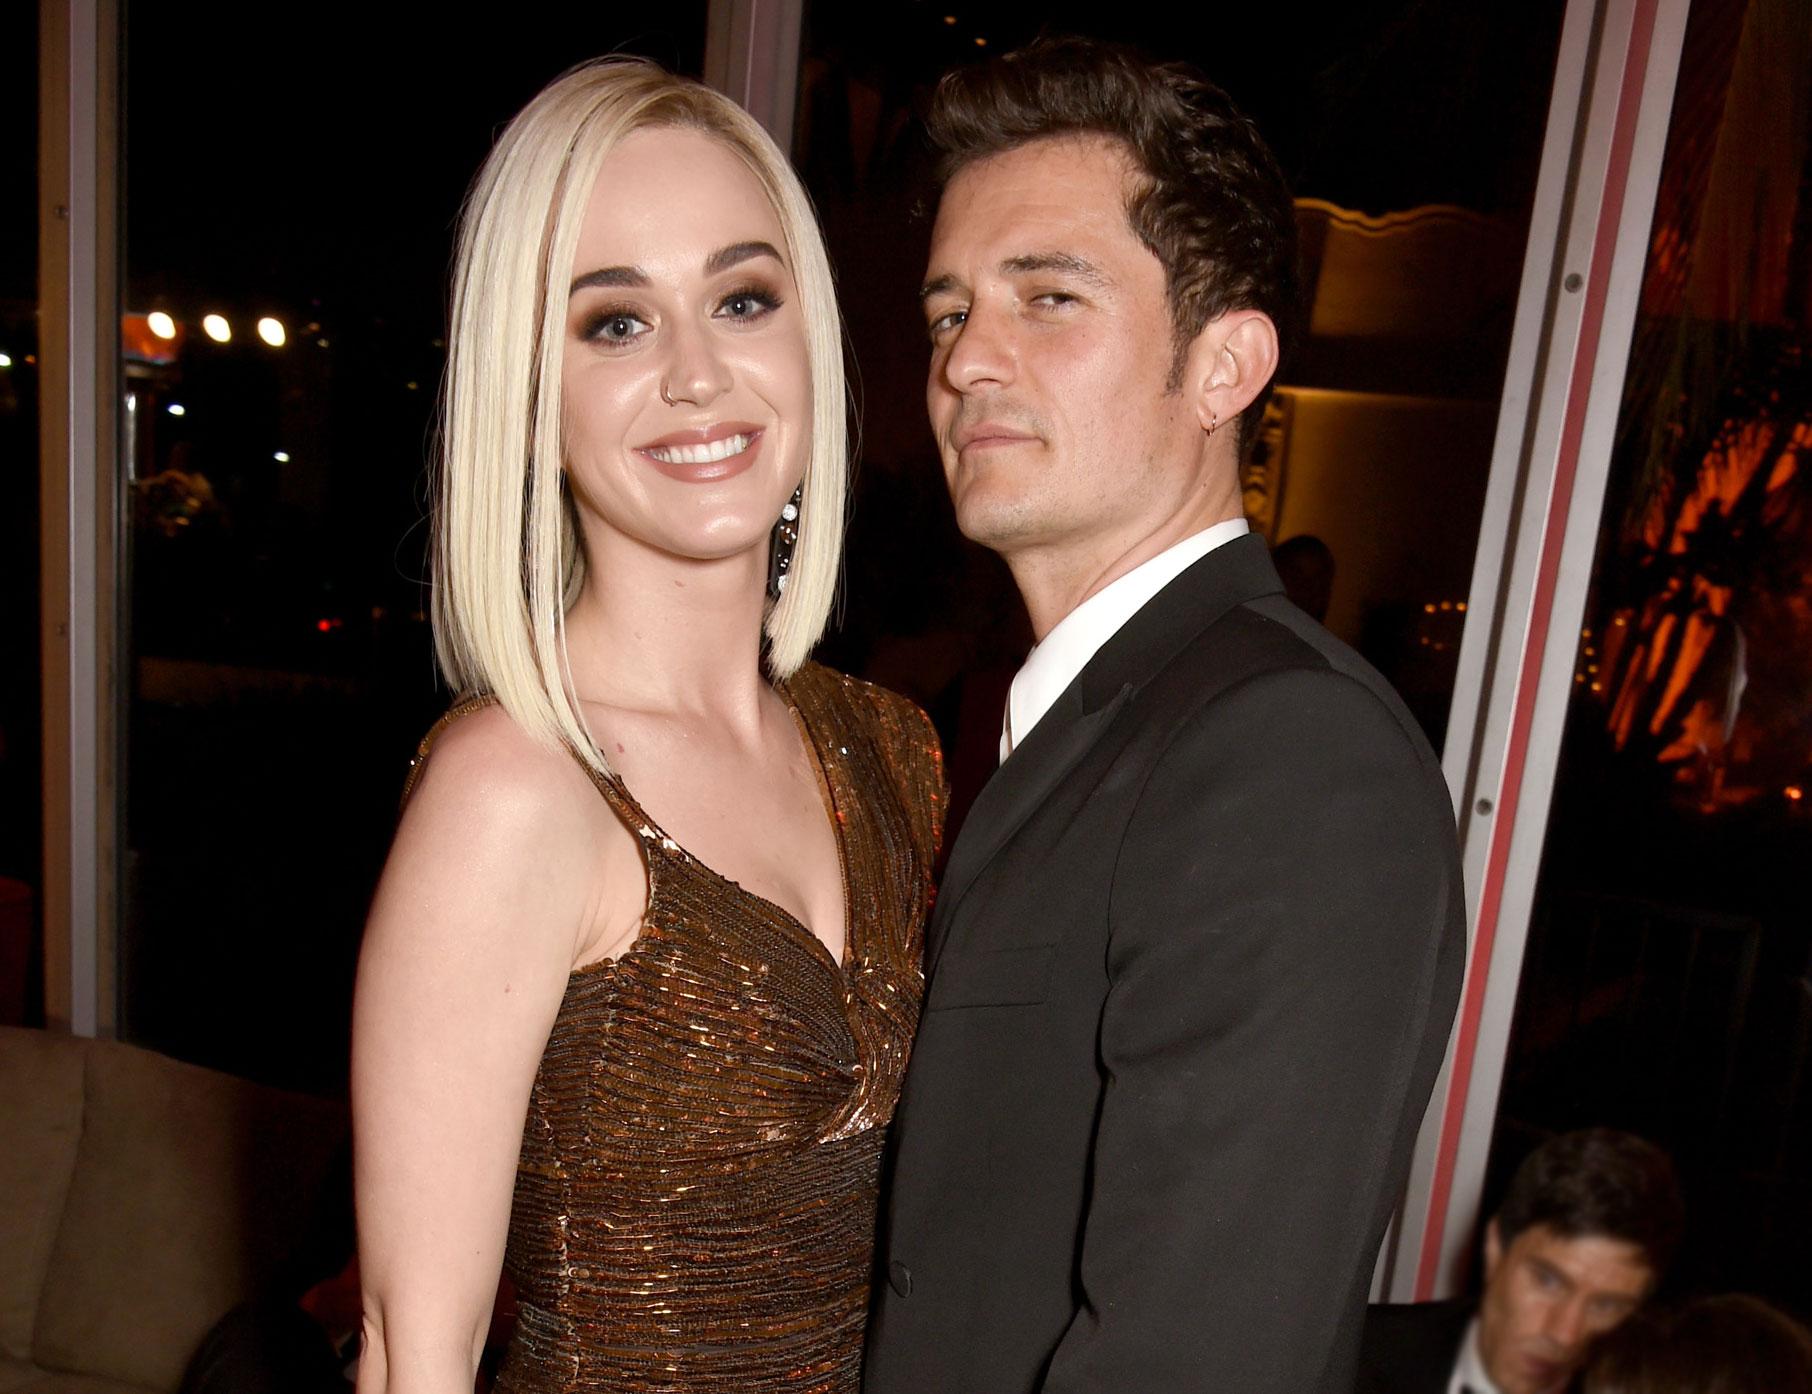 Celeb Engagements of 2019 Katy Perry Orlando Bloom - Katy Perry, Orlando Bloom